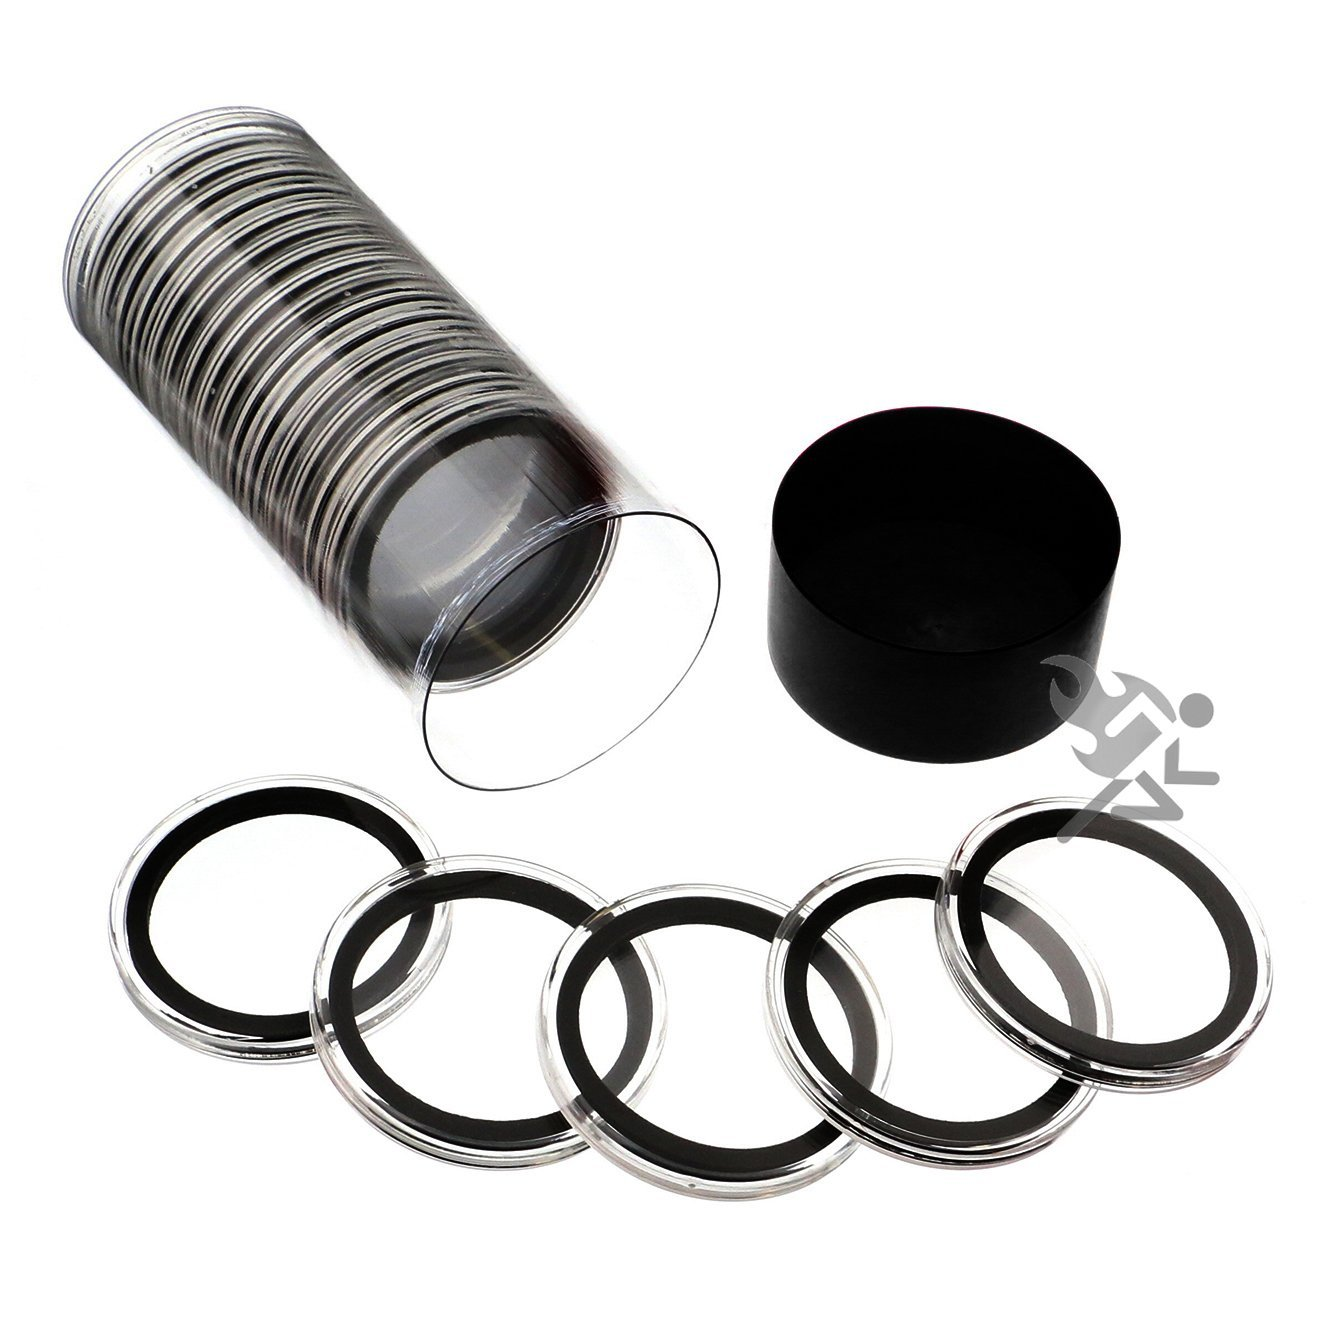 Black Lid Capsule Tube /& 15 Air-Tite X39mm Black Ring Coin Holders